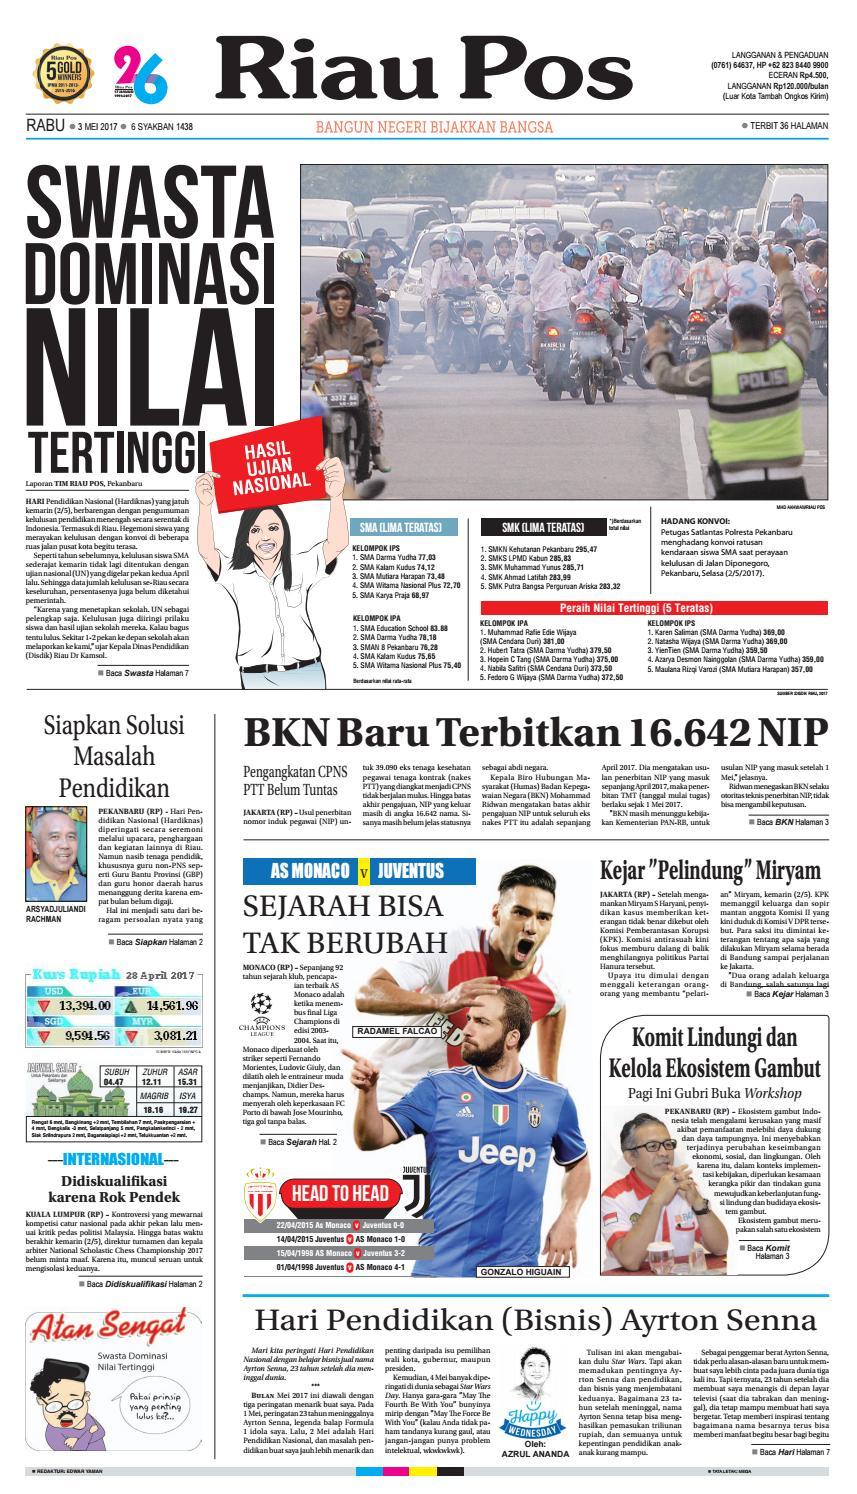 2017 05 03 By Riau Pos Issuu Kemeja Anak Tangan Panjang Stripe Hitam Putih Rsby 2829